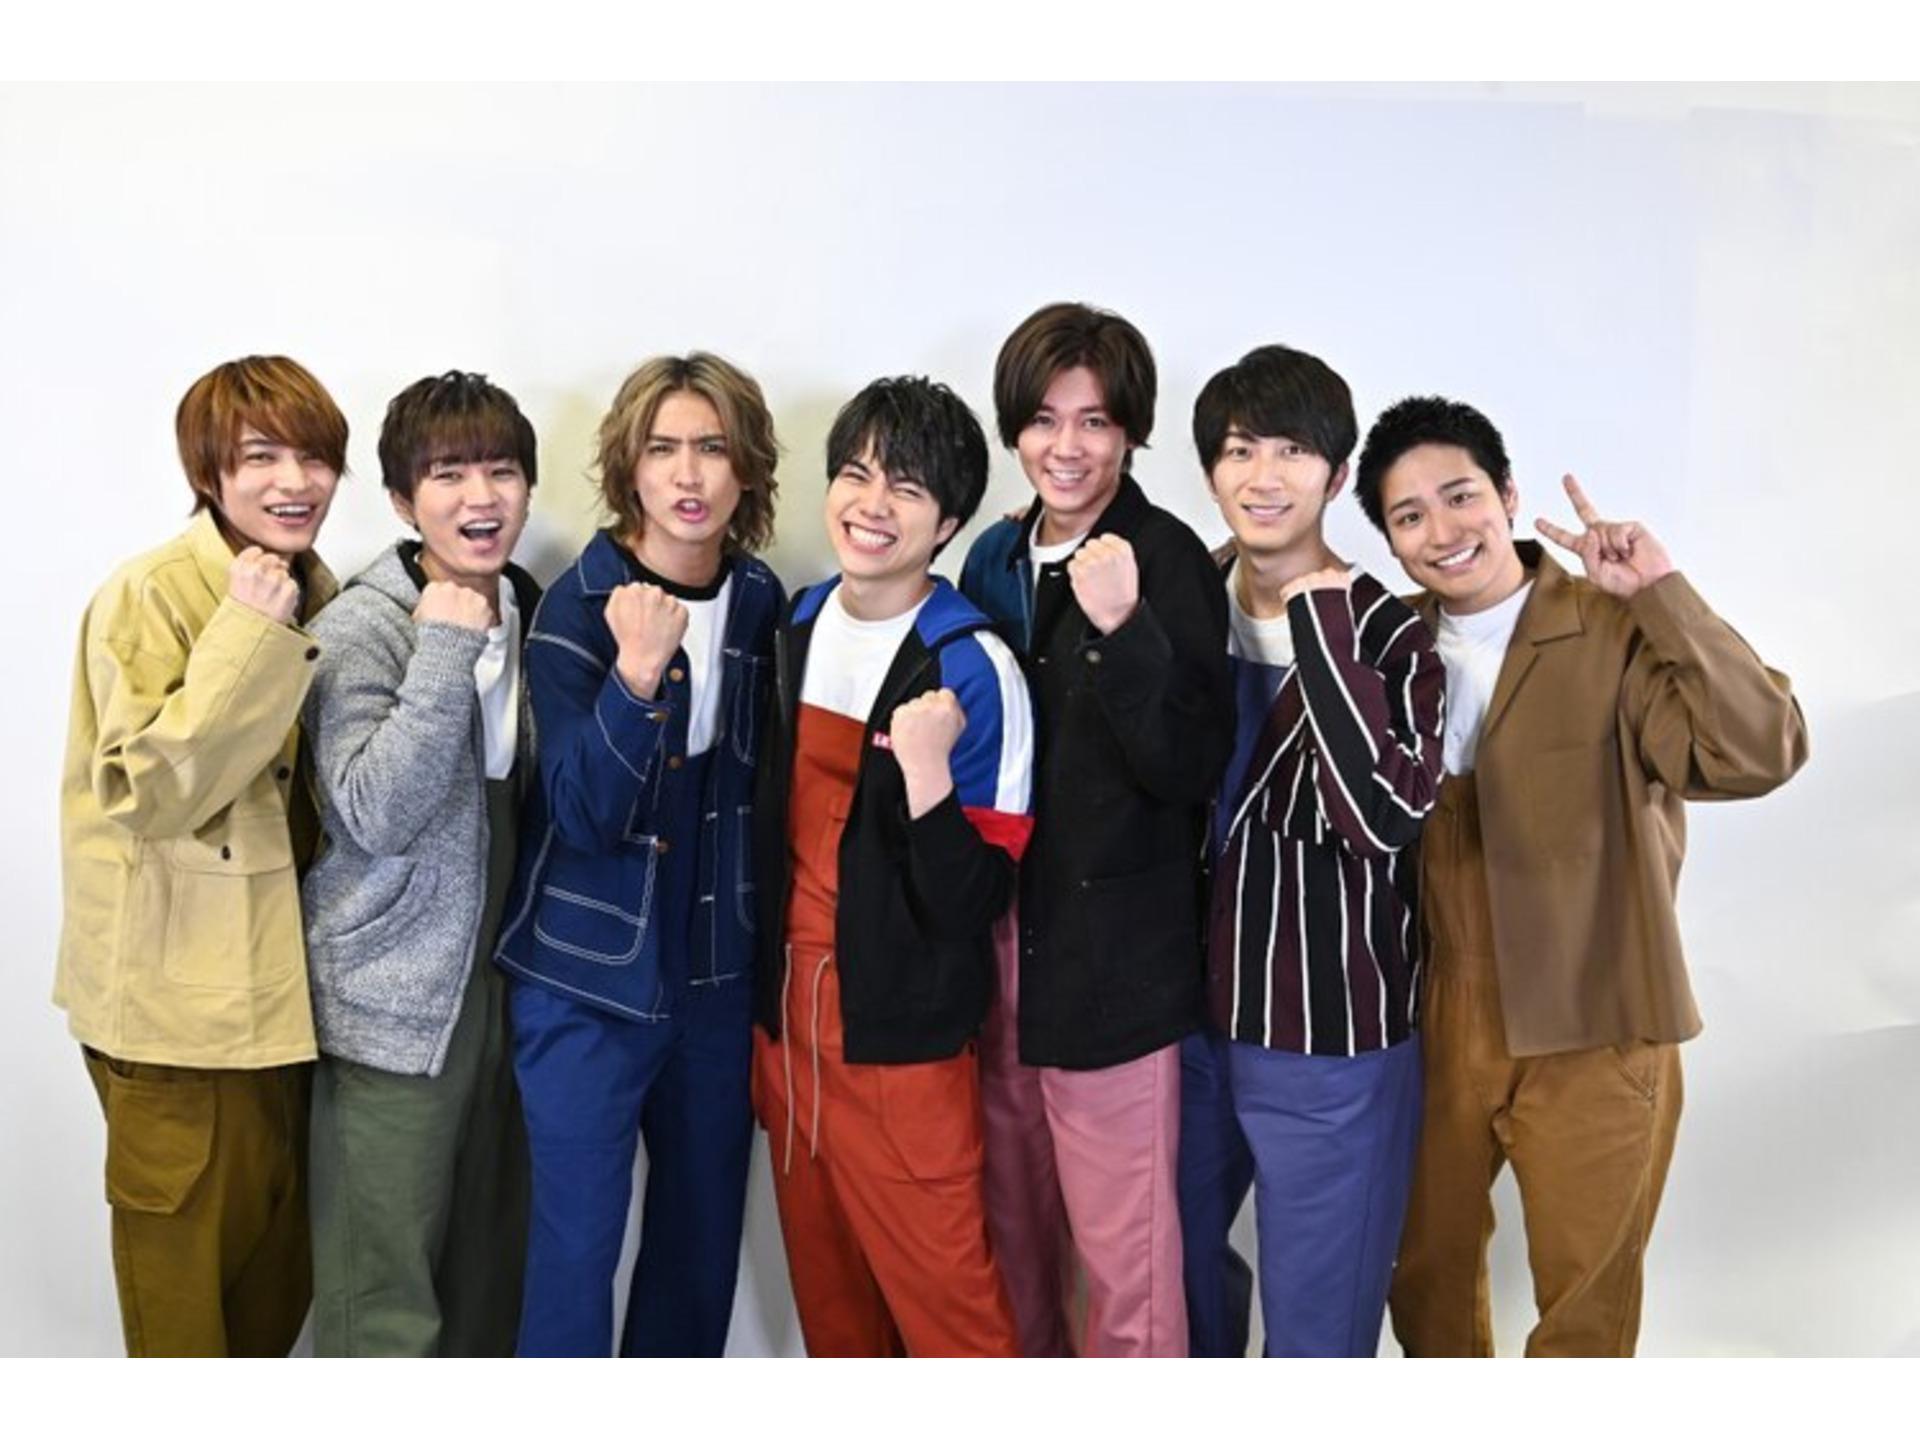 TOKIO 嵐 KAT-TUN Hey! Say! JUMP 在籍】株式会社ジャニーズ所属 ...